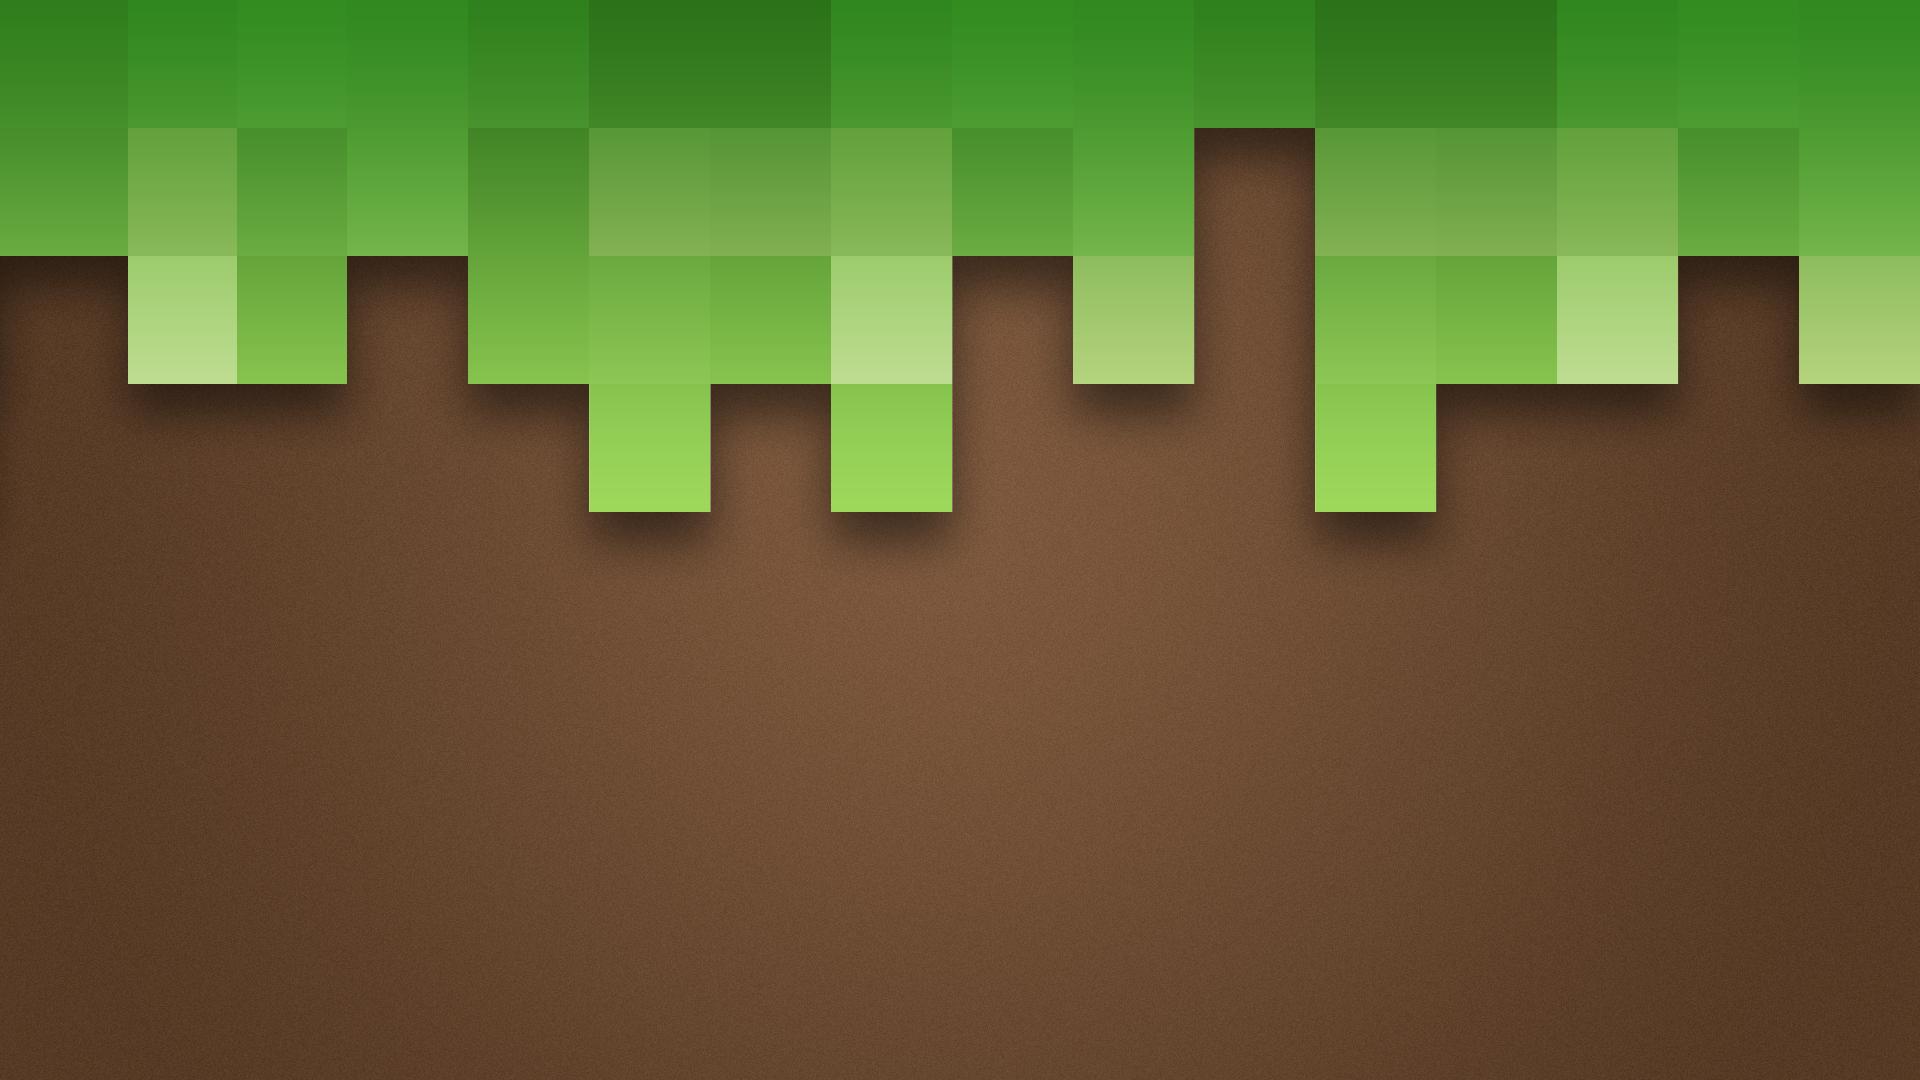 Minecraft HD - Minecraft HD PNG